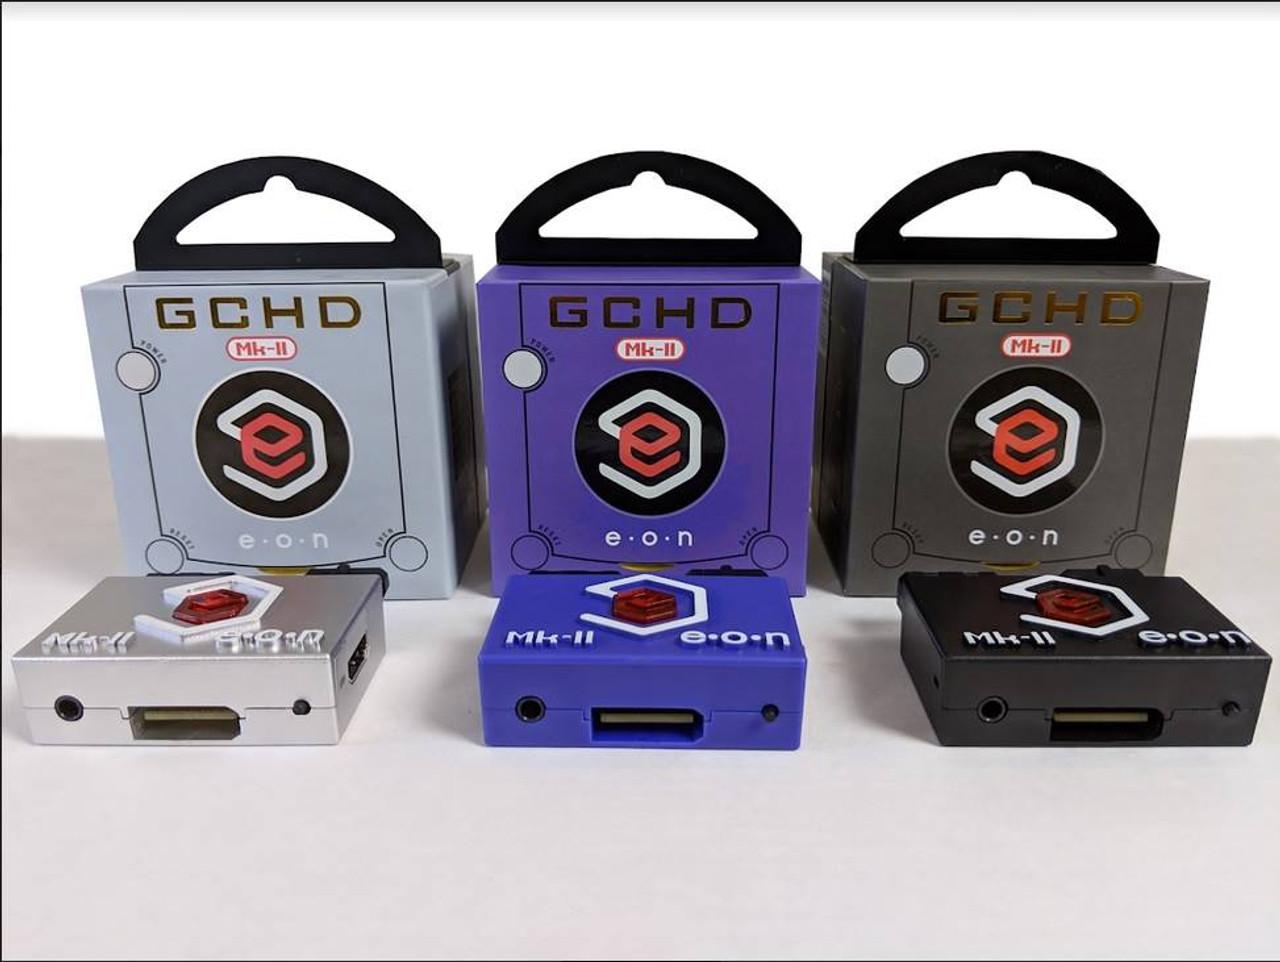 GCHD Mk  II Plug 'n Play HDMI GameCube Adapter HD 480p